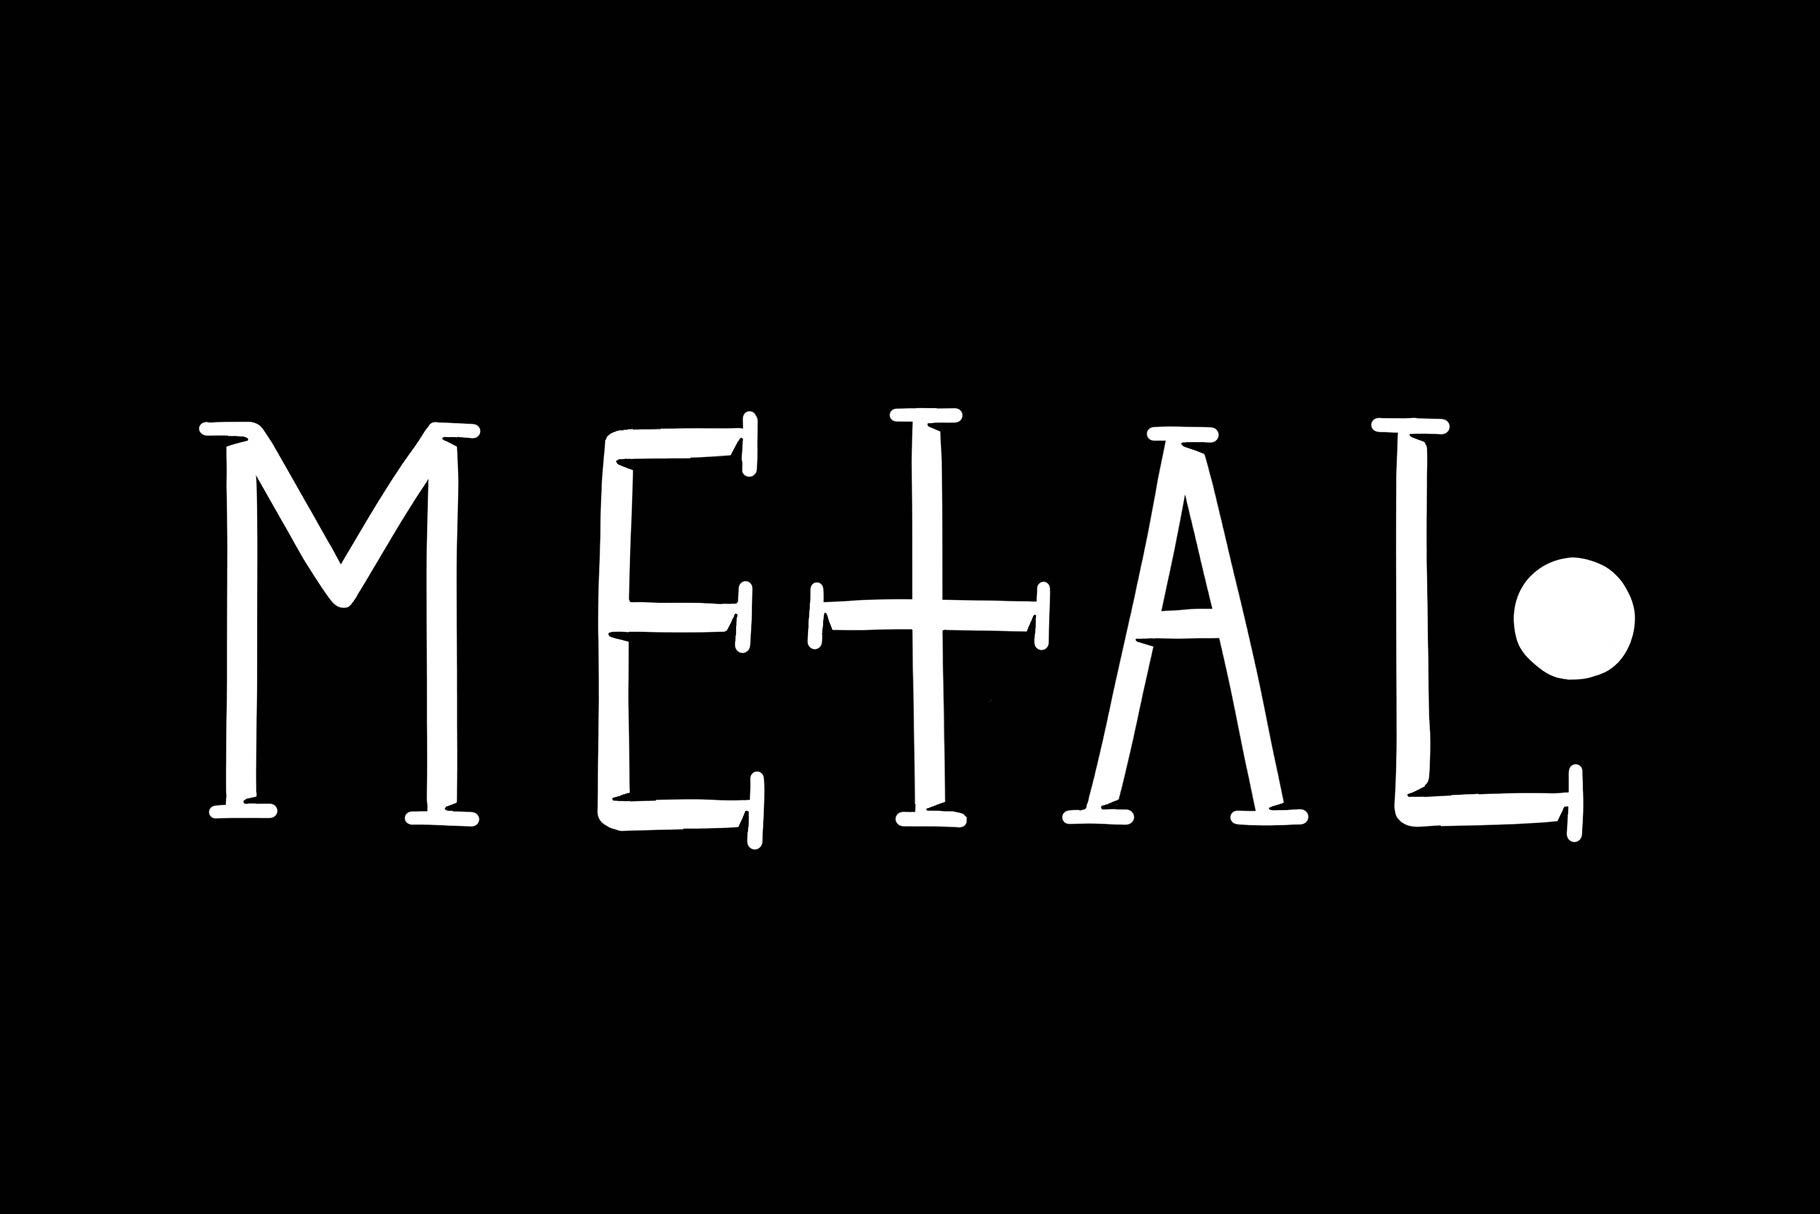 METAL – Gothic Font